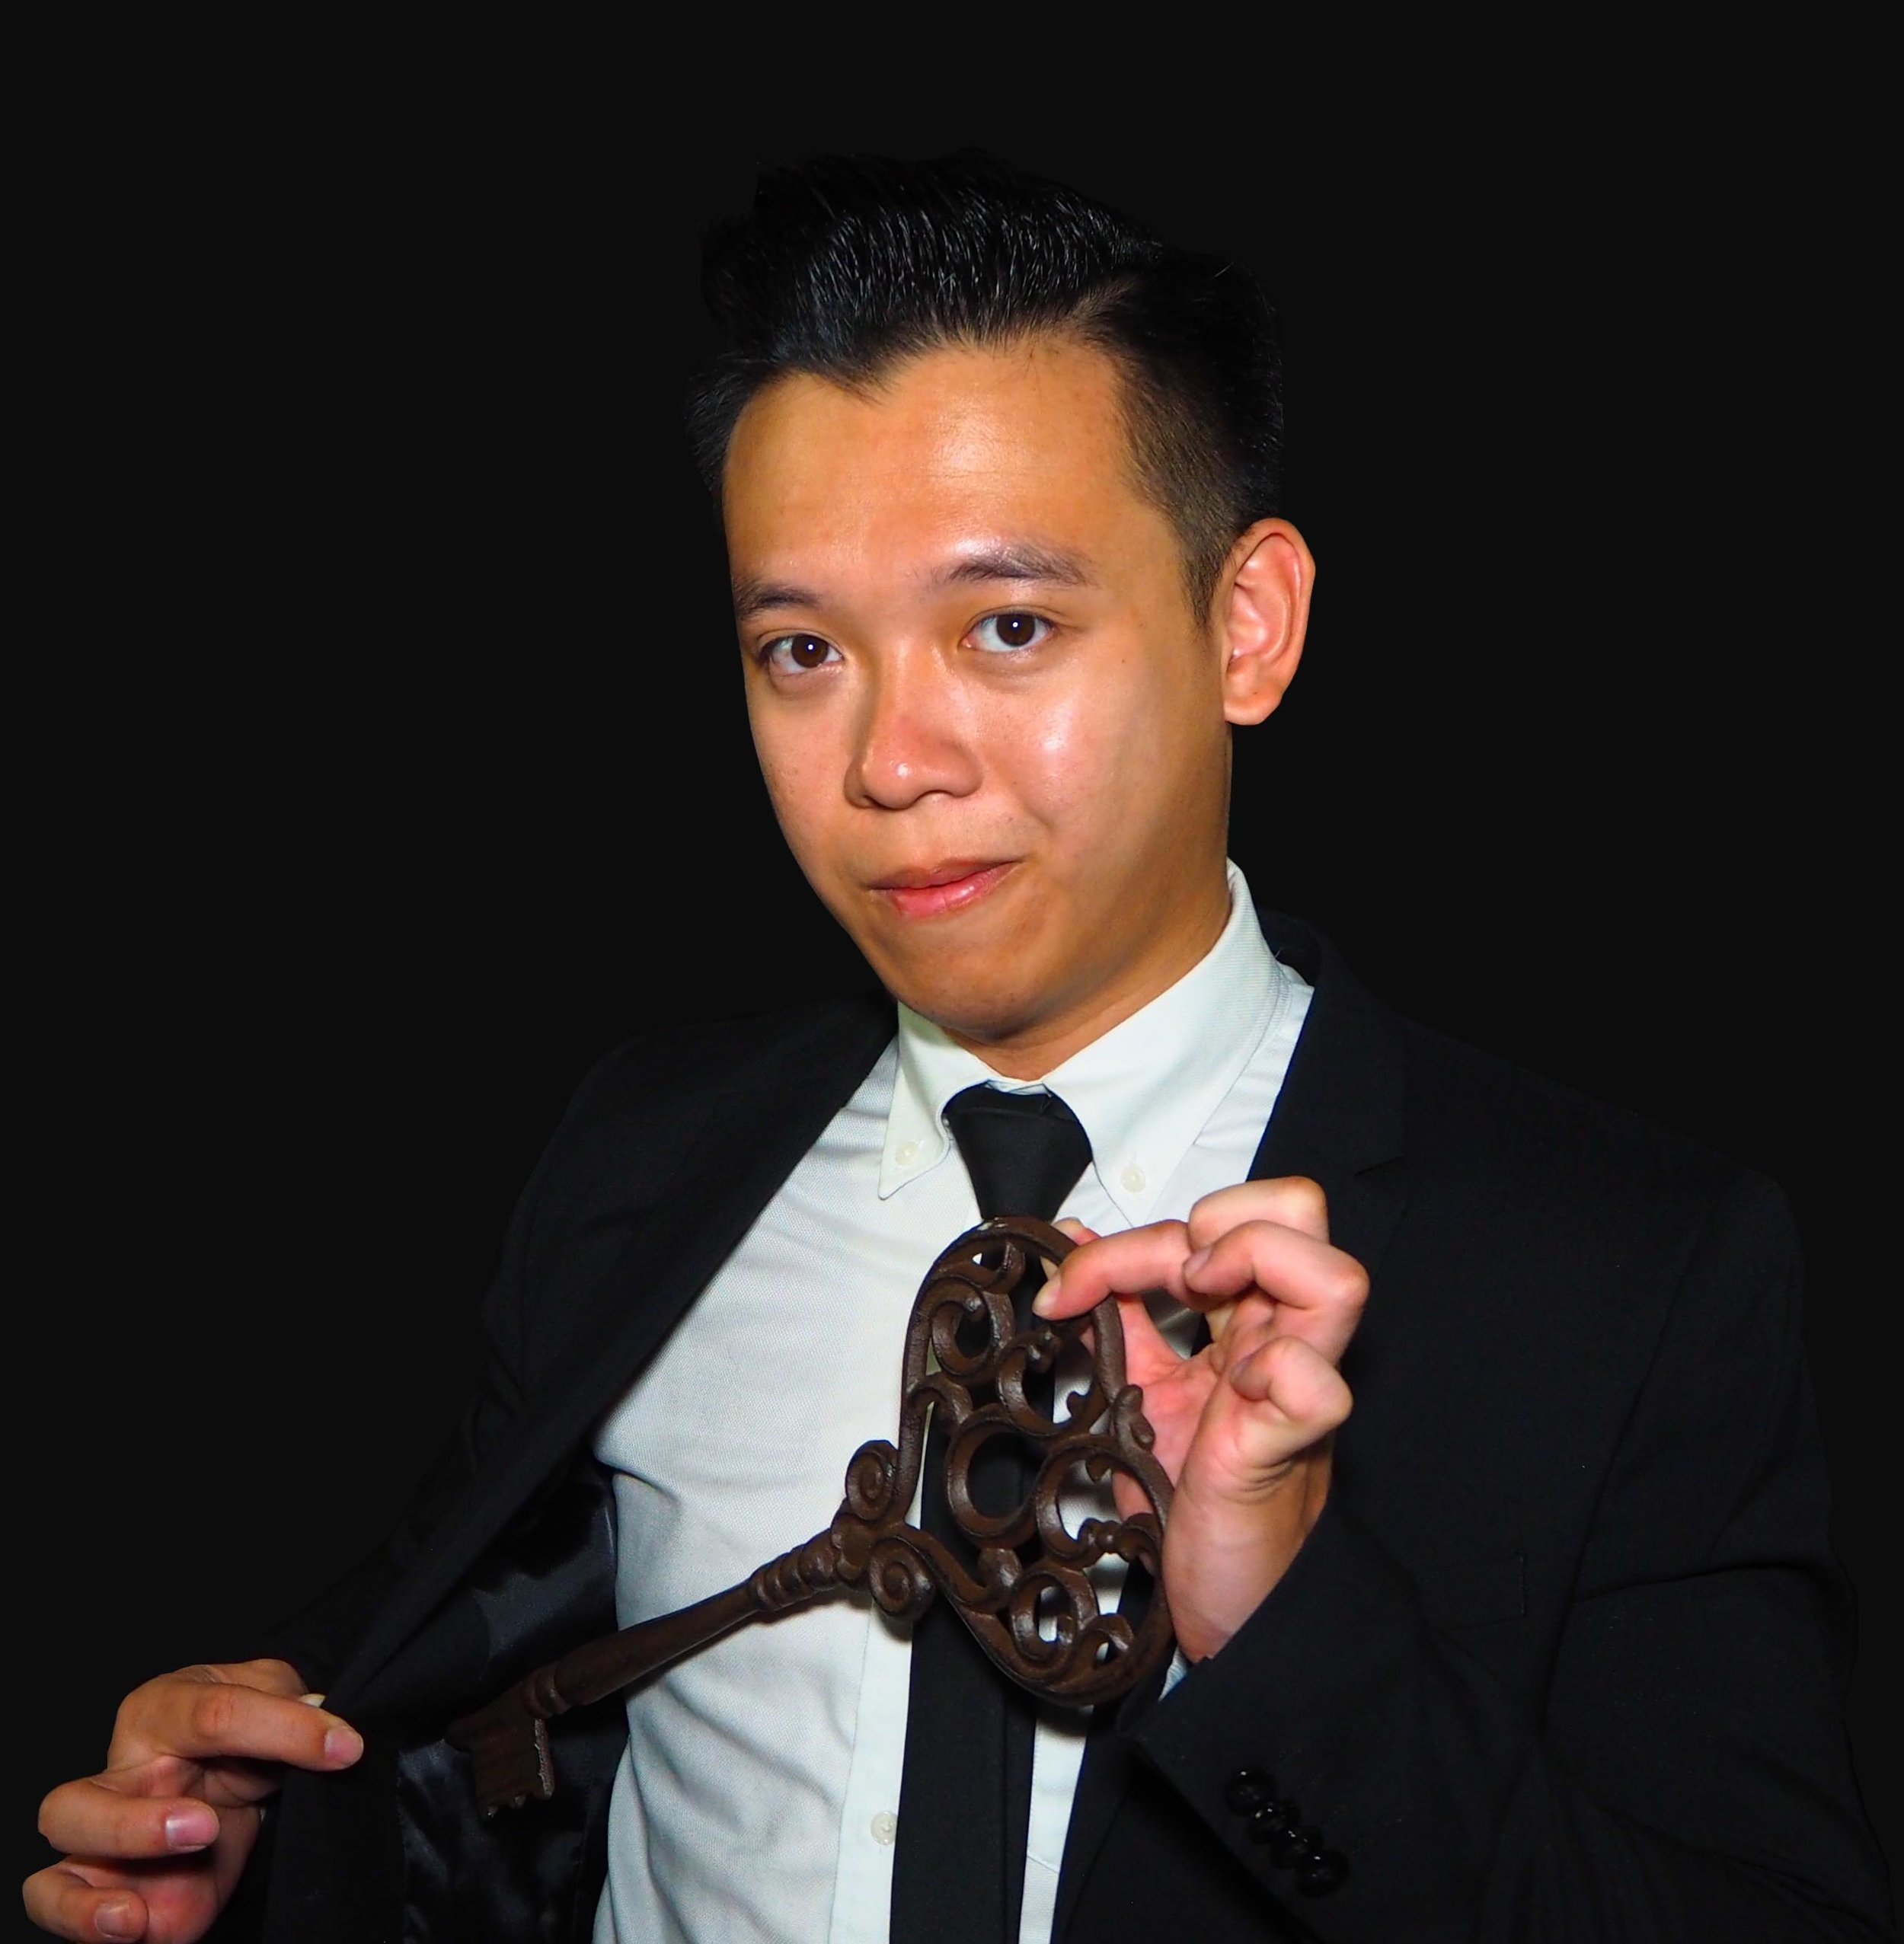 Tan Yu Ji - Magician | Half of The Strangers